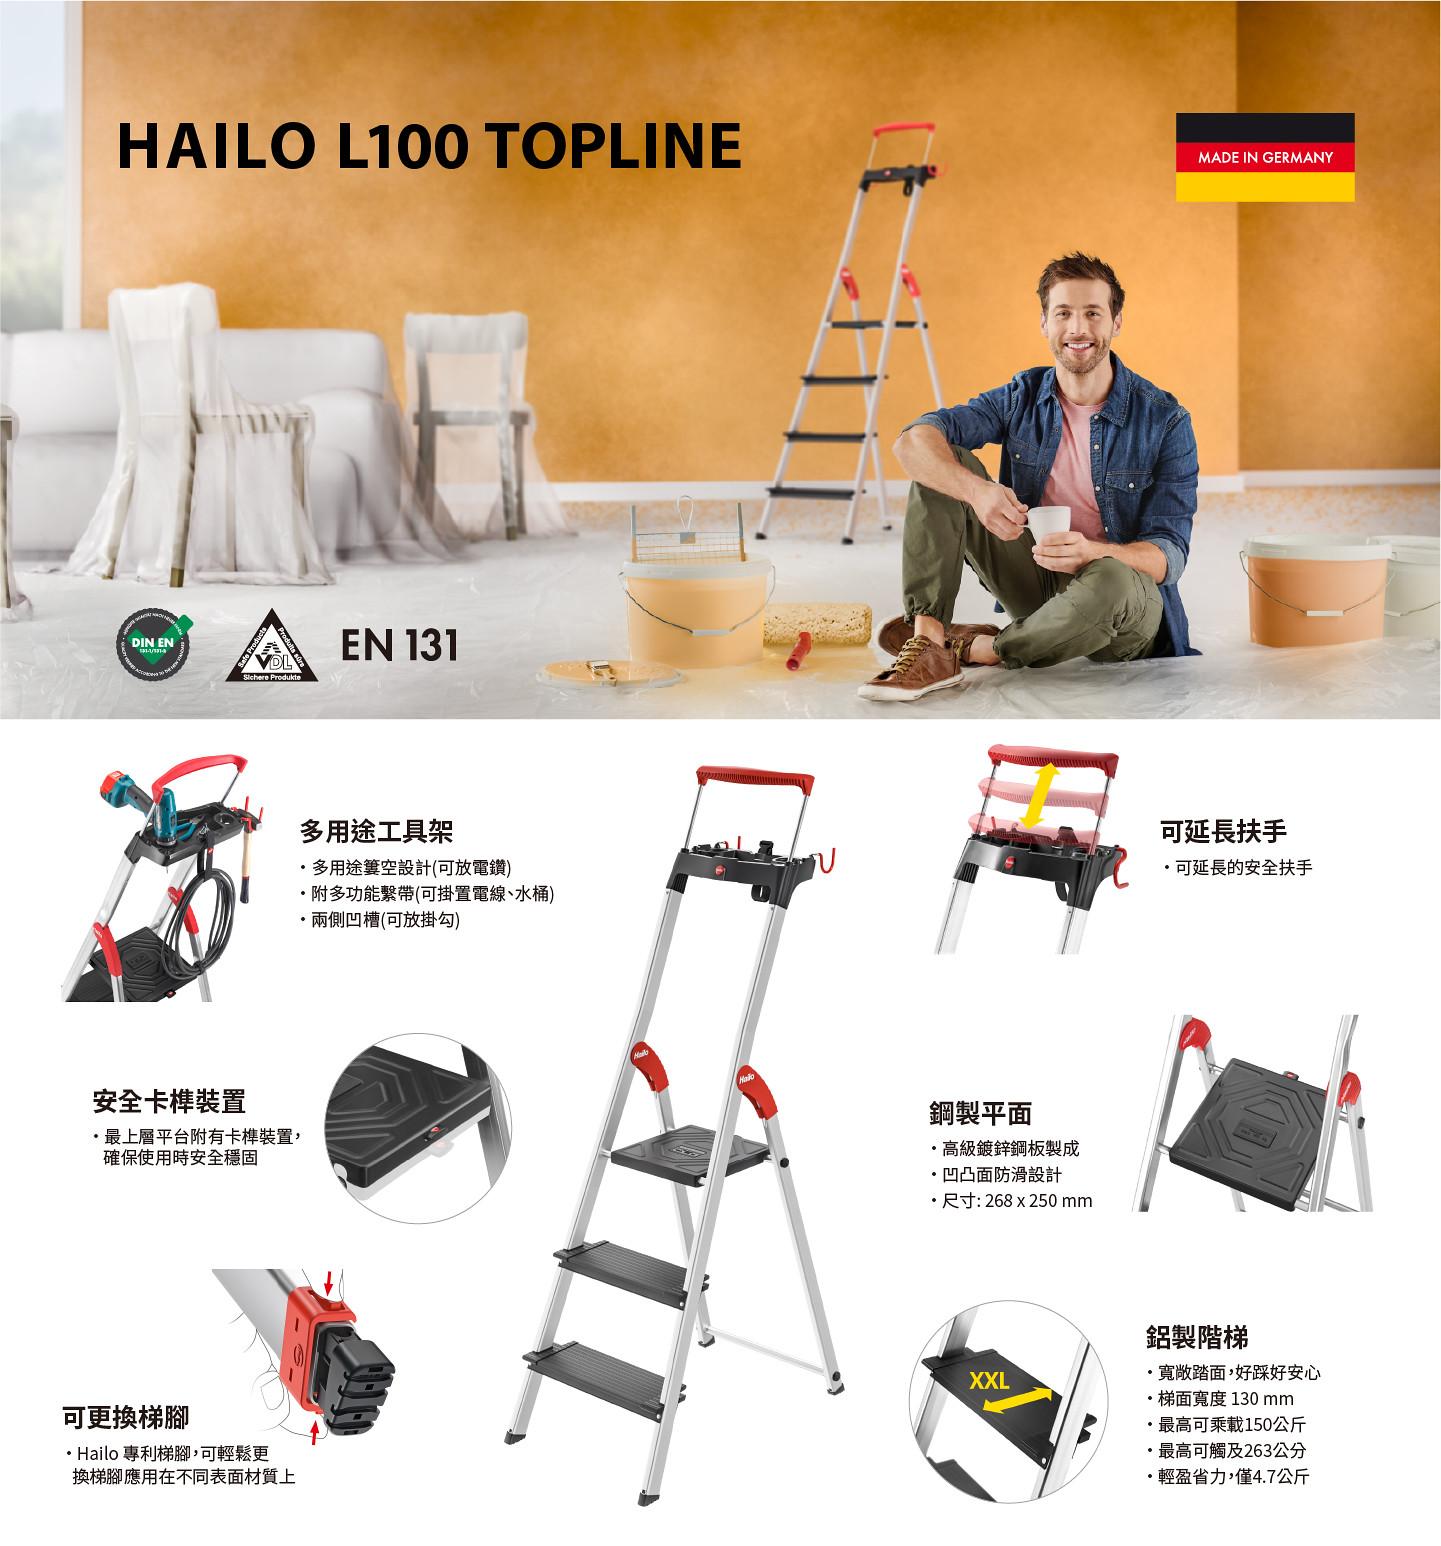 Hailo-L100Topline-3steps